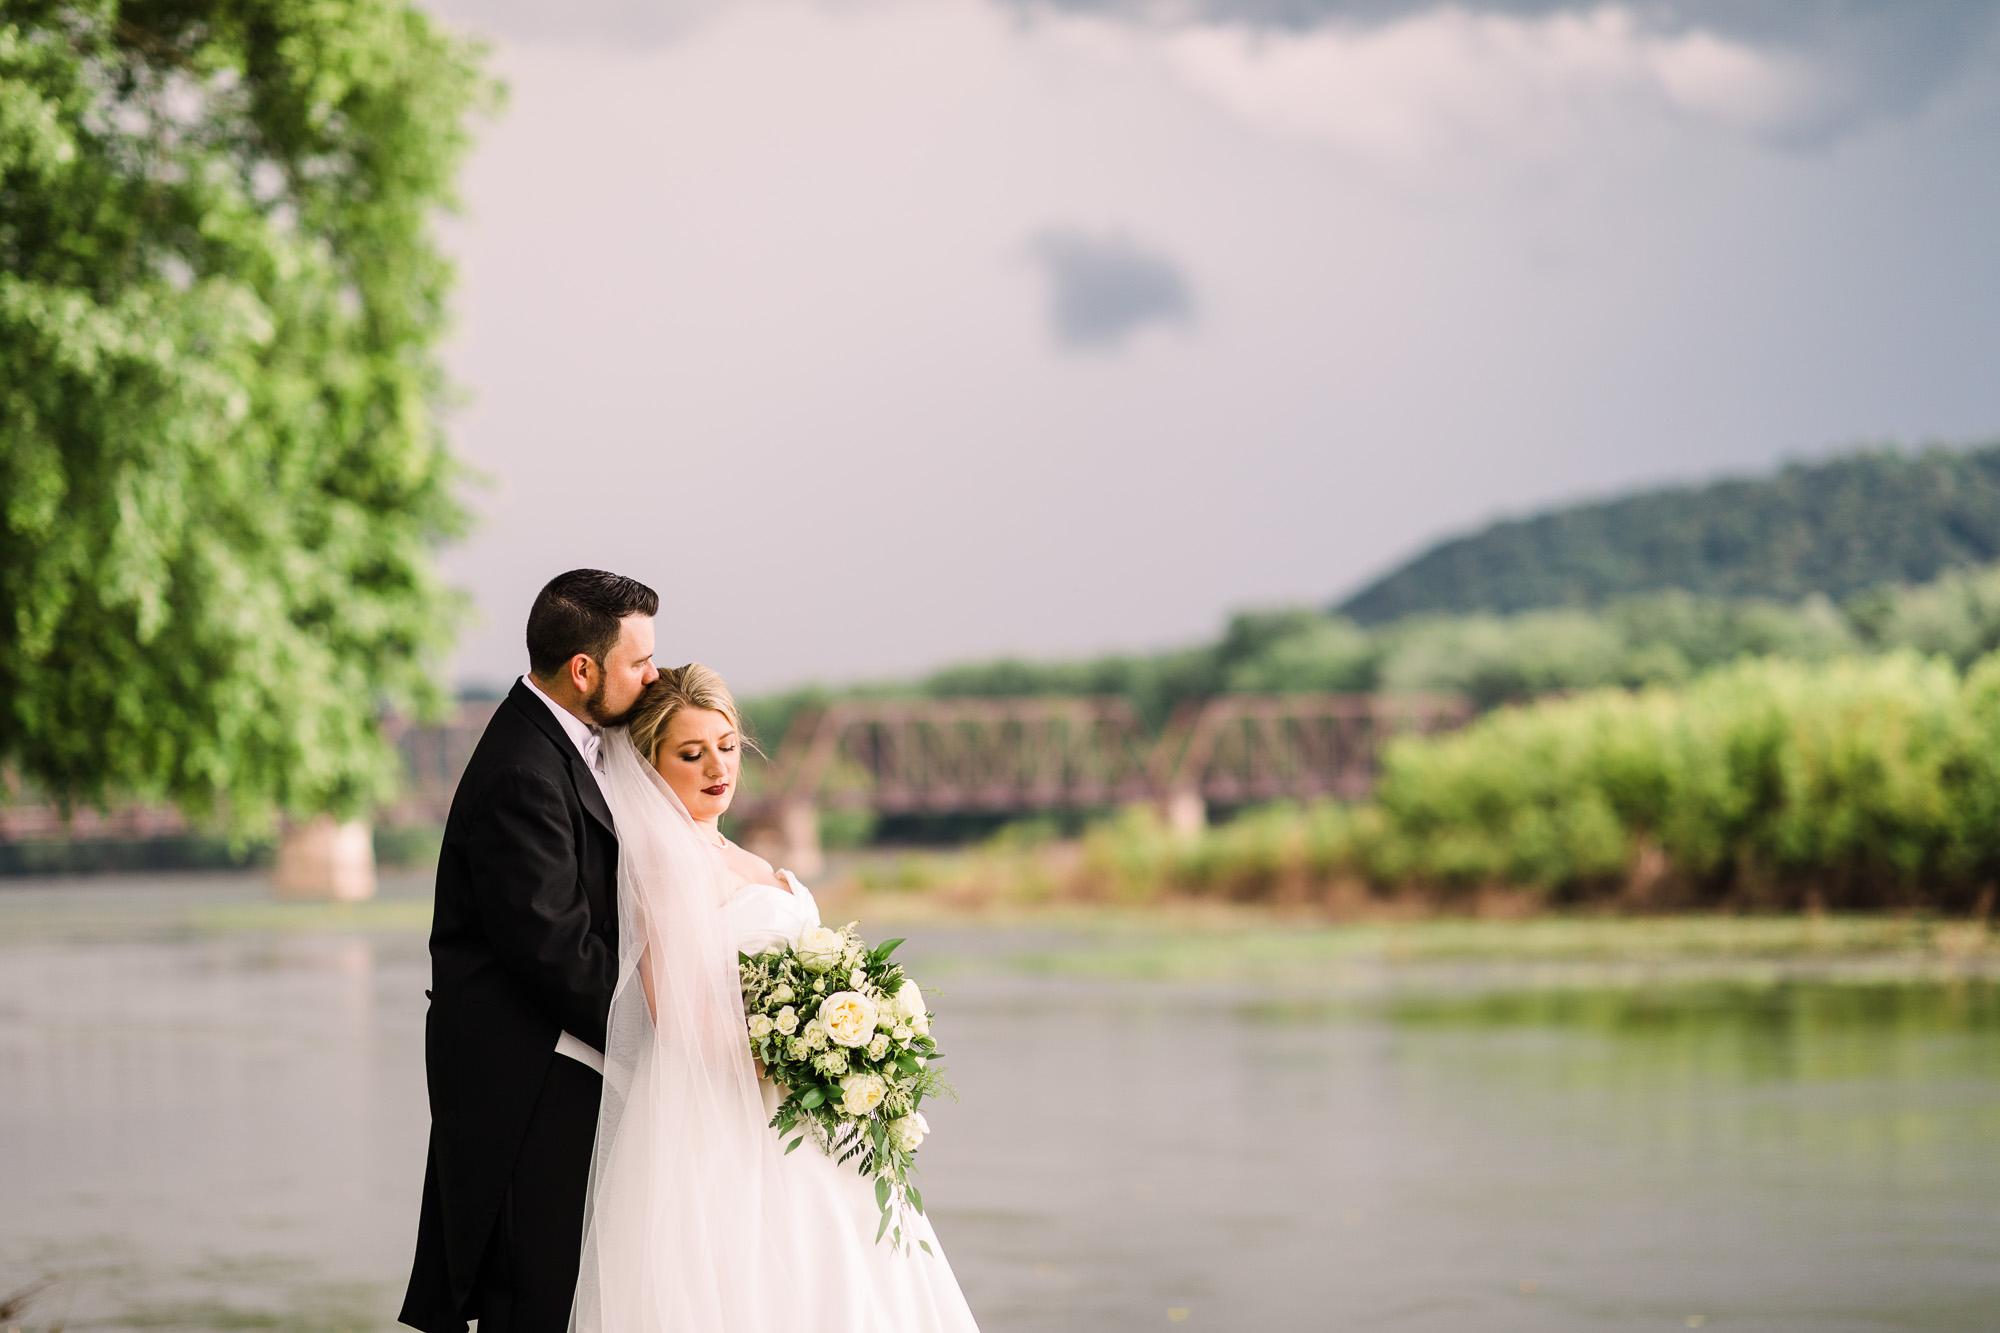 isle-of-que-wedding-4143.jpg